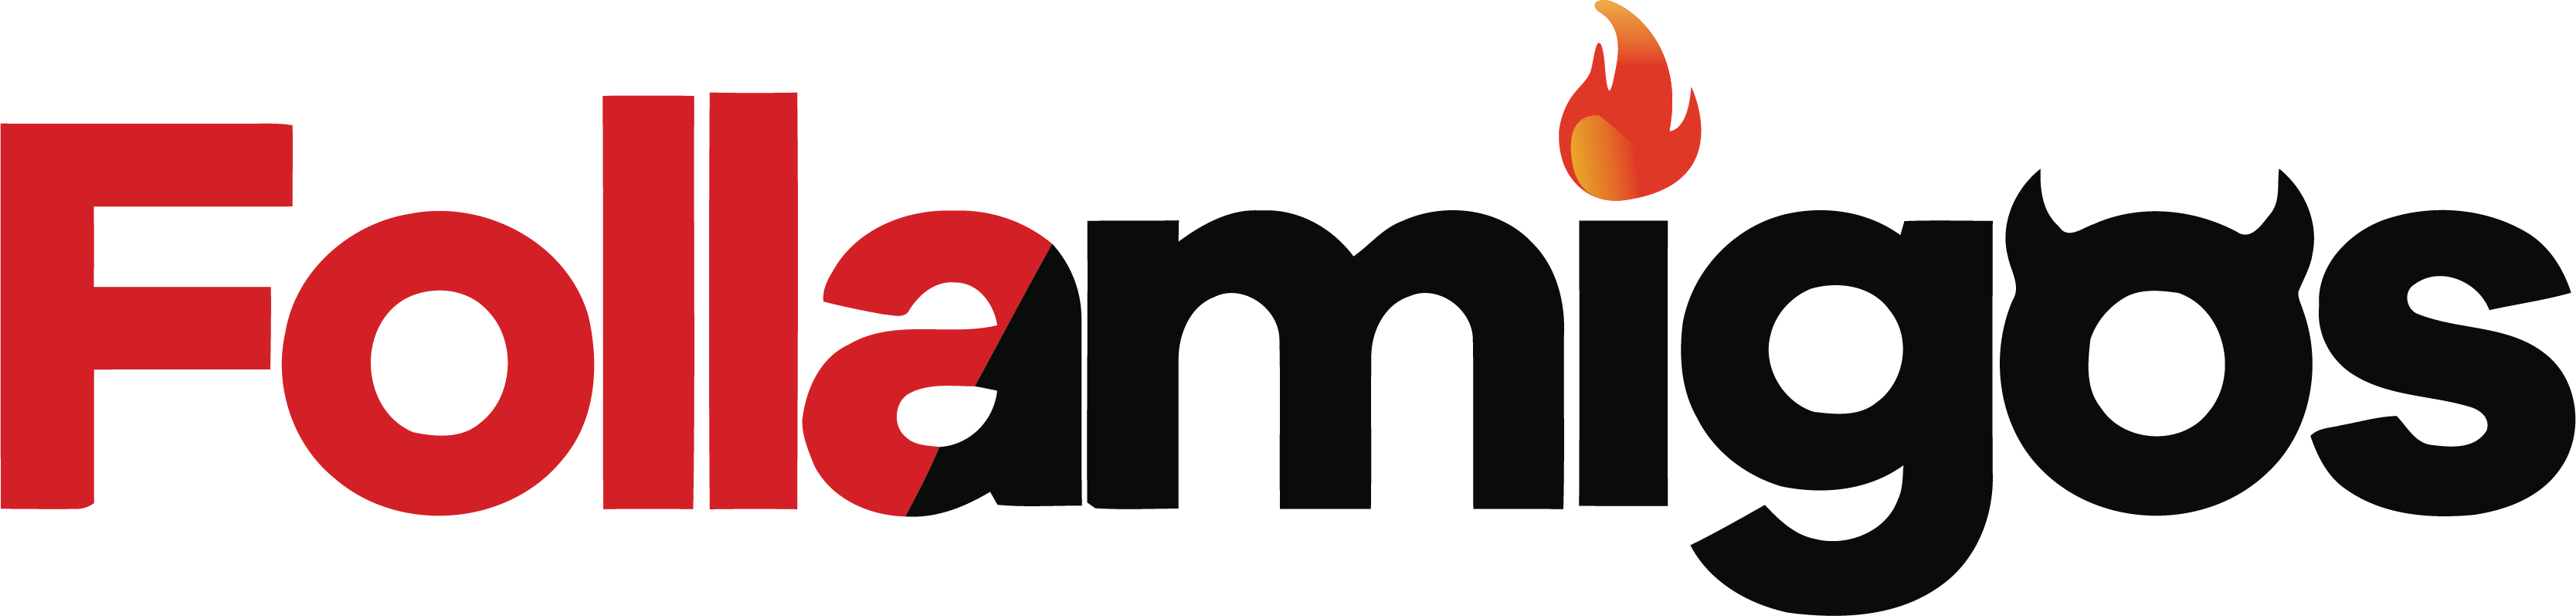 Logotipo web de citas sexuales Follamigos